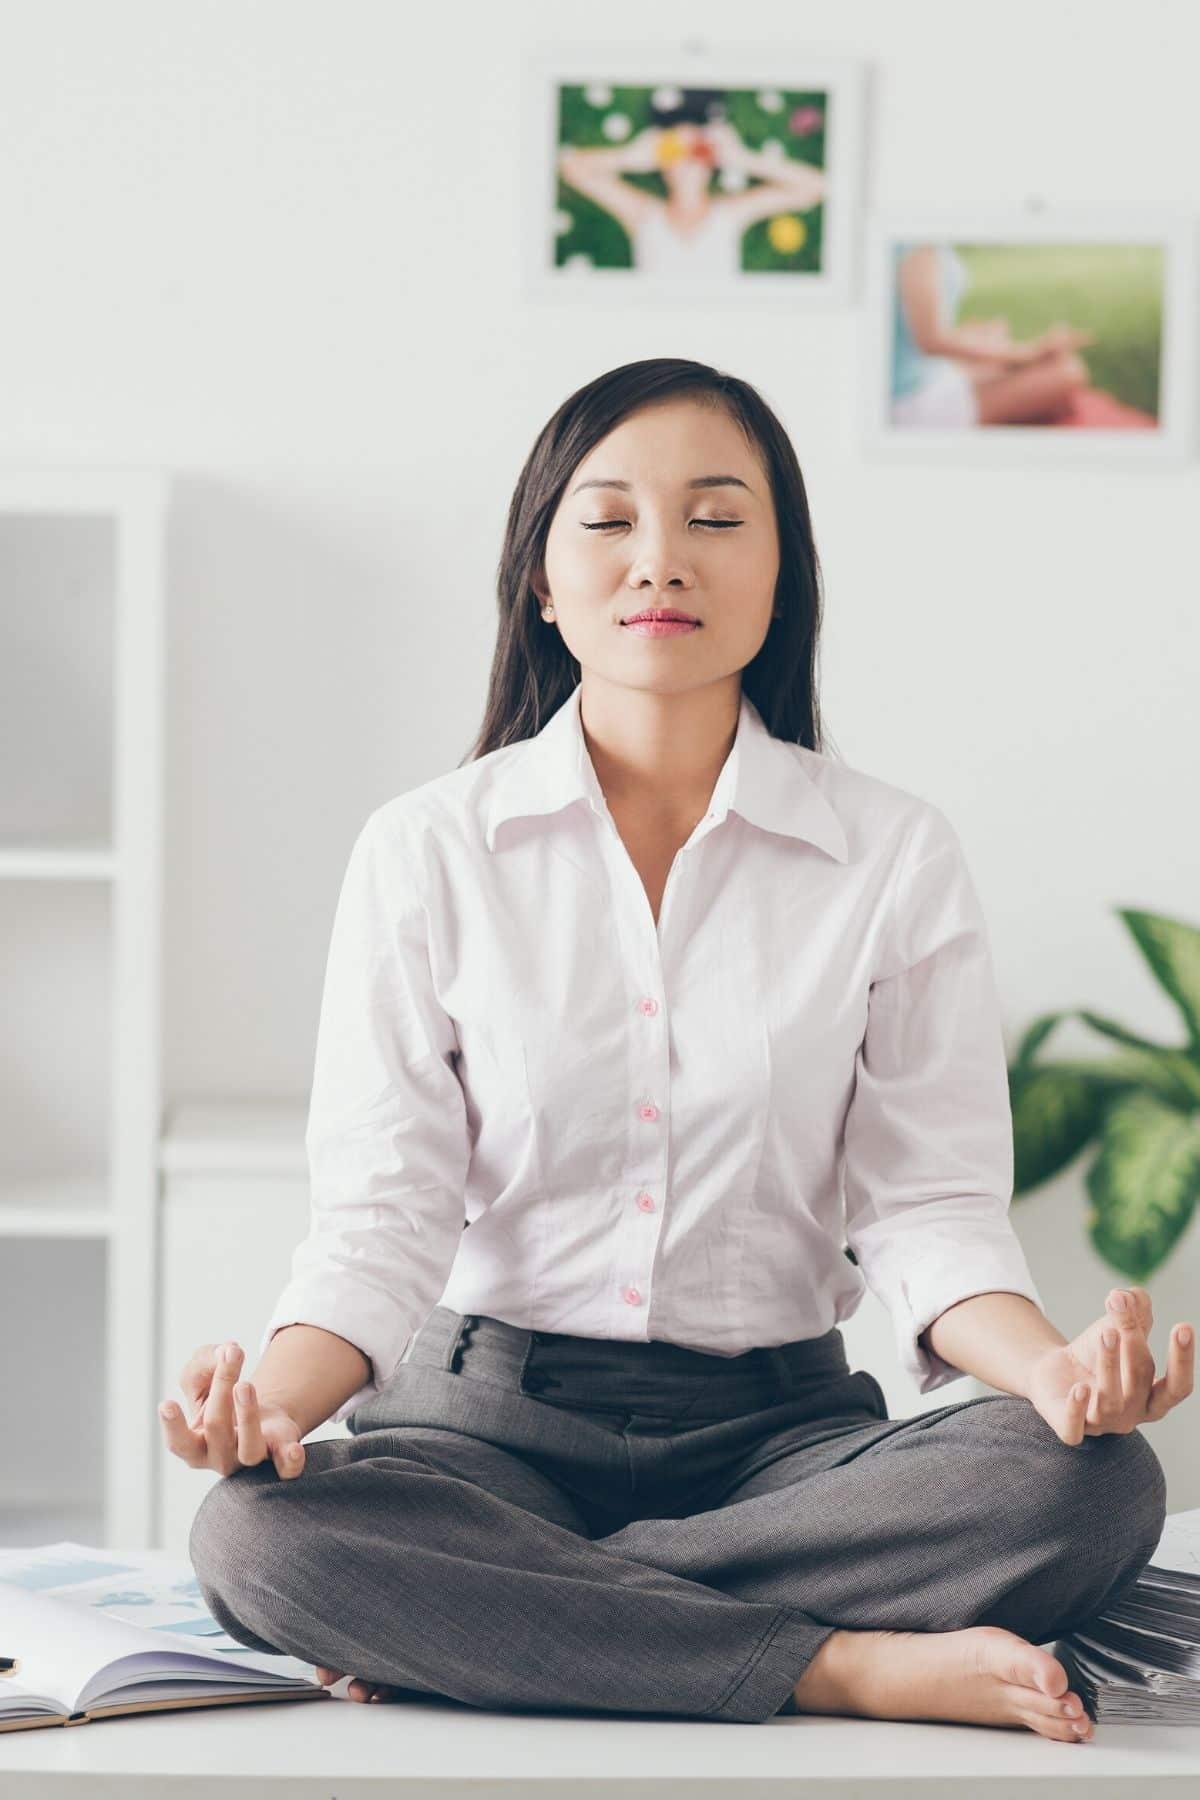 woman meditating at the office